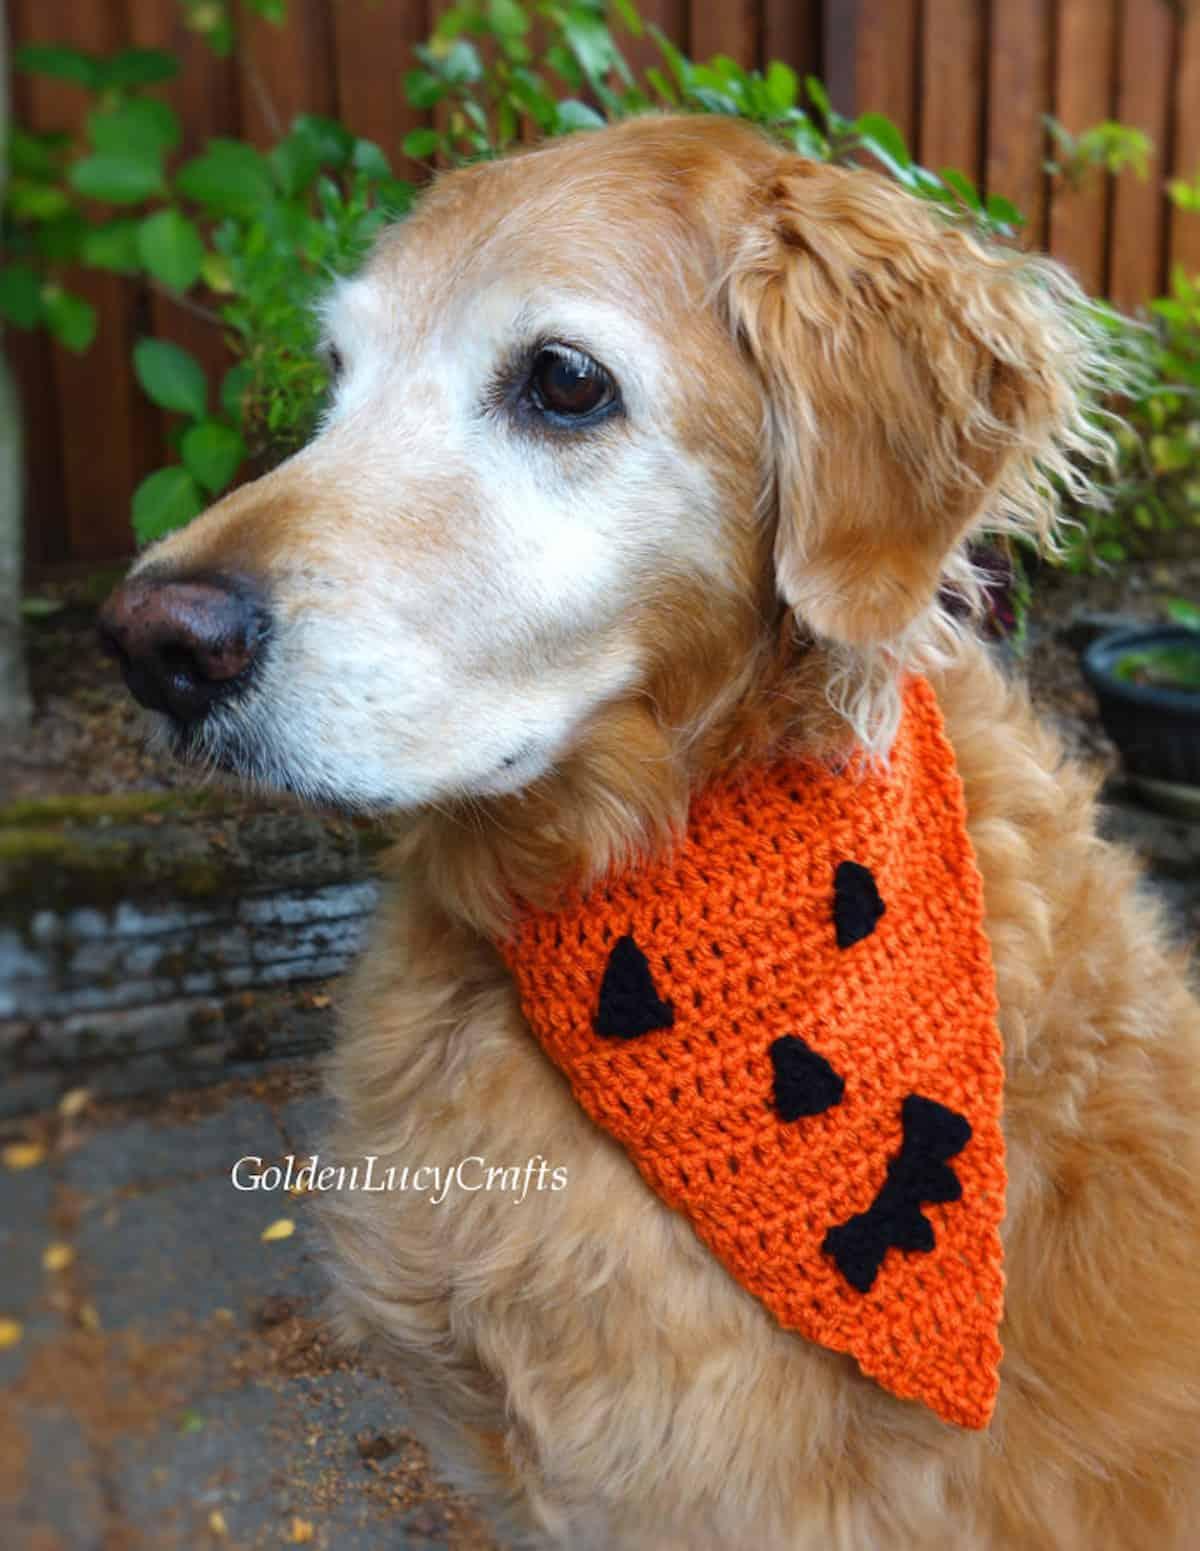 Golden retriever dressed in crochet Halloween bandana.